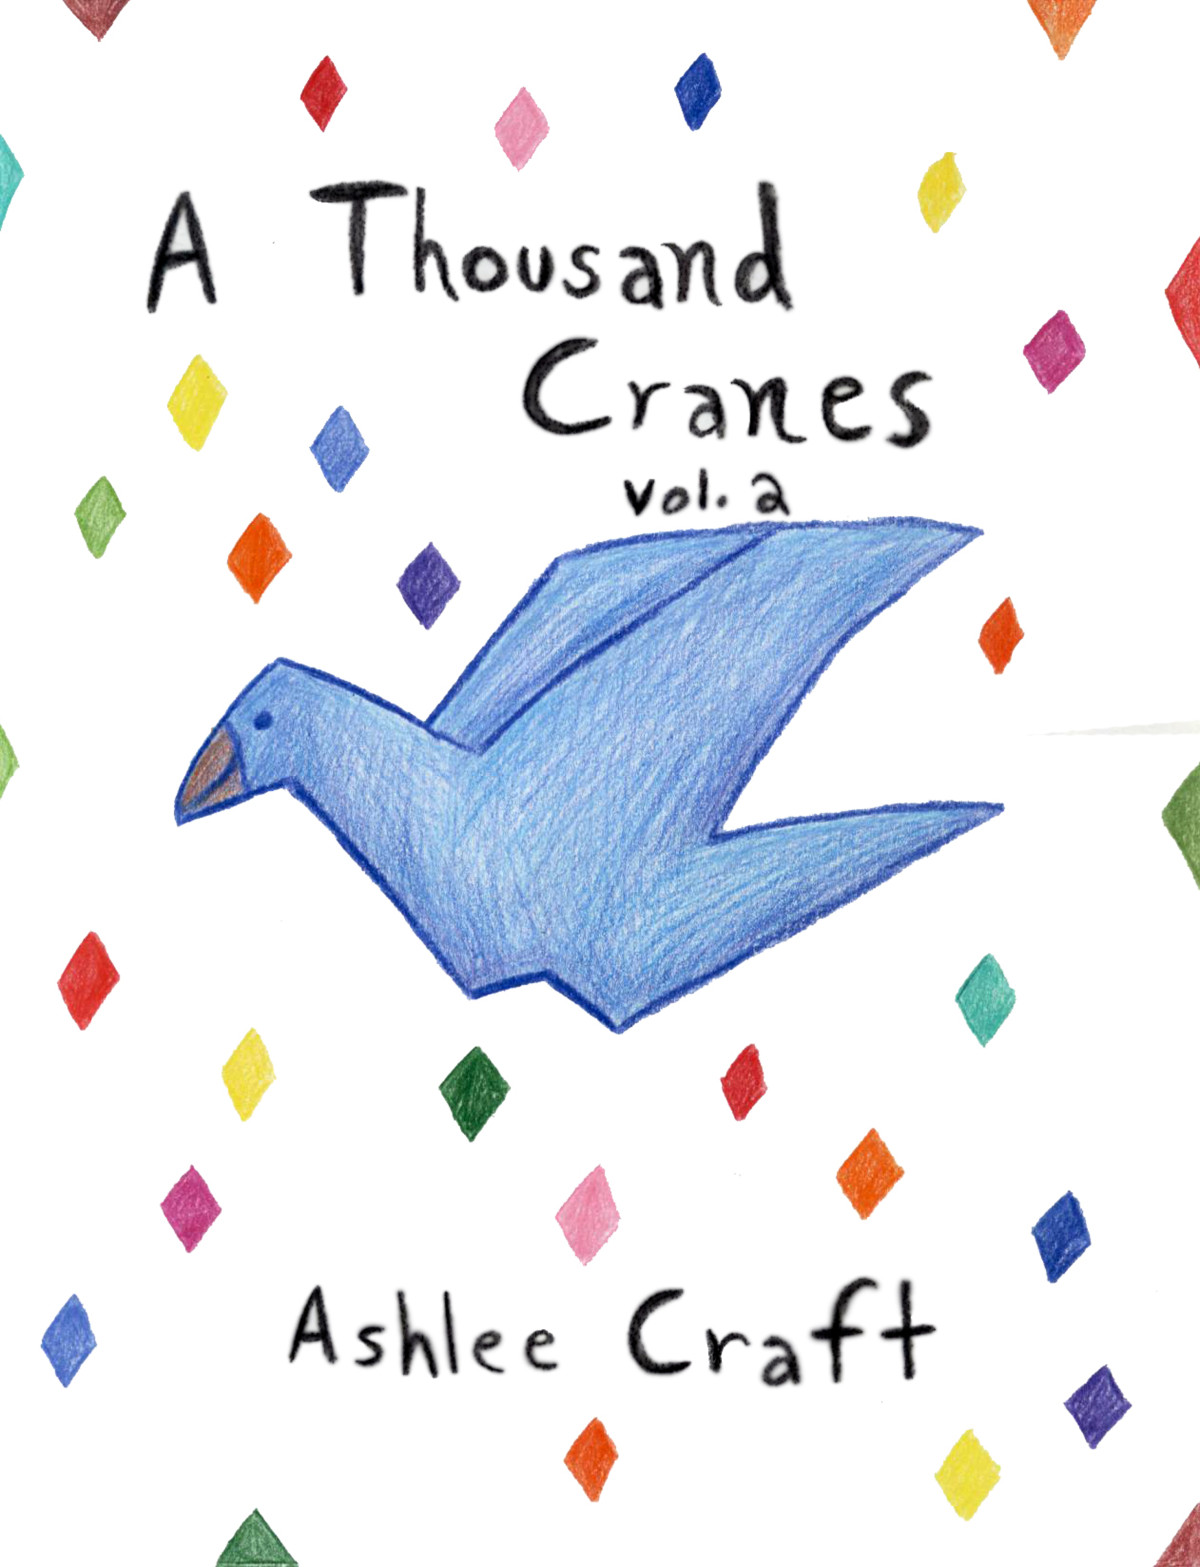 A Thousand Cranes - Volume 2